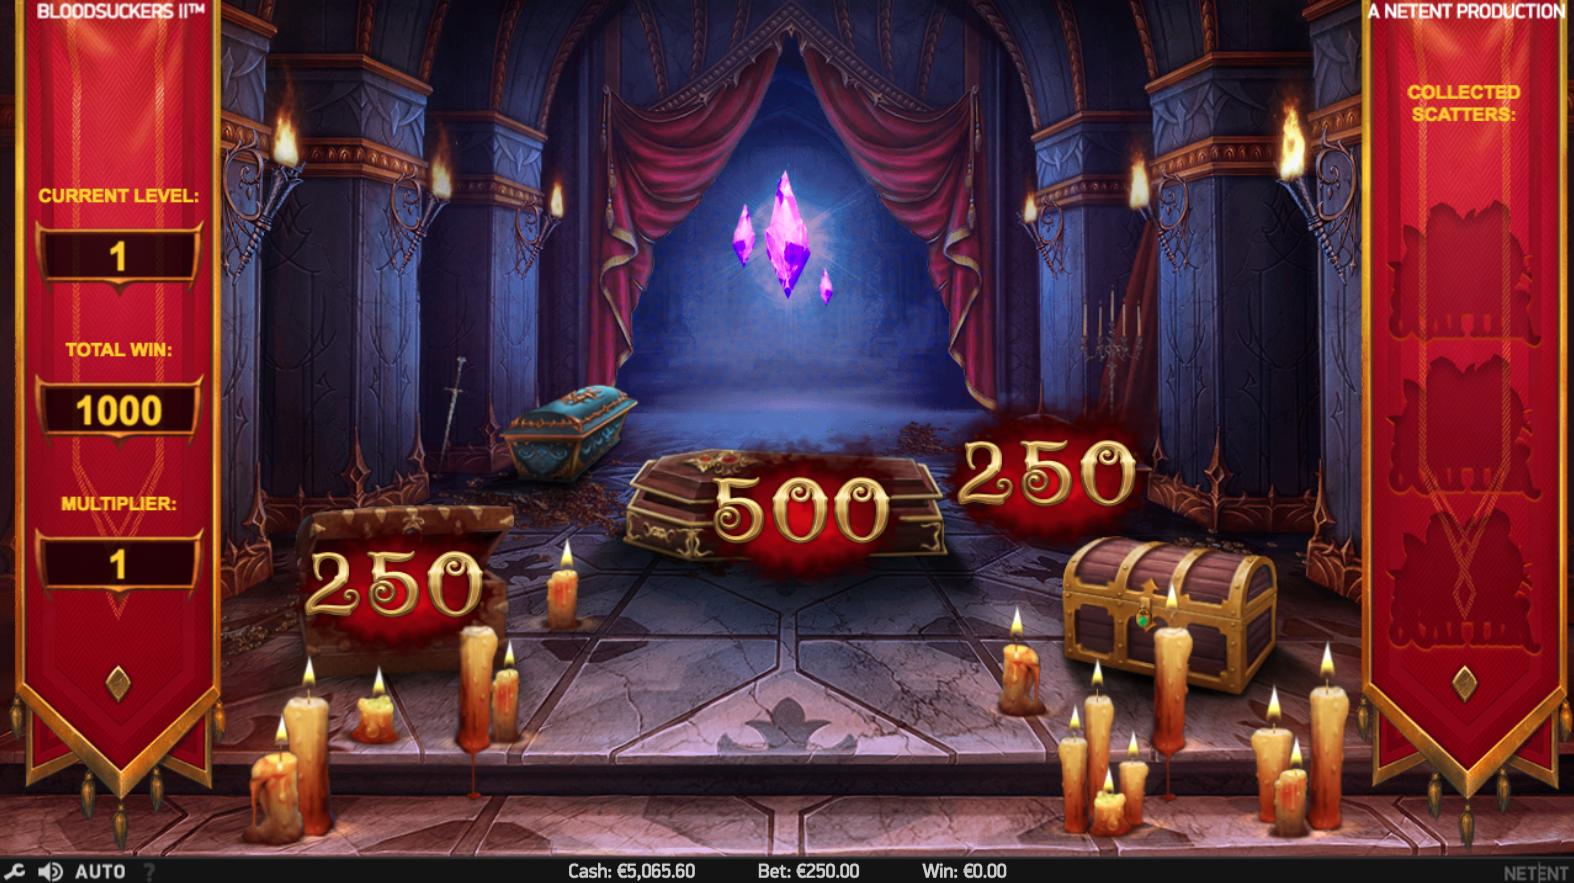 Blood Suckers II bonusrunde Hidden Treasure bonus